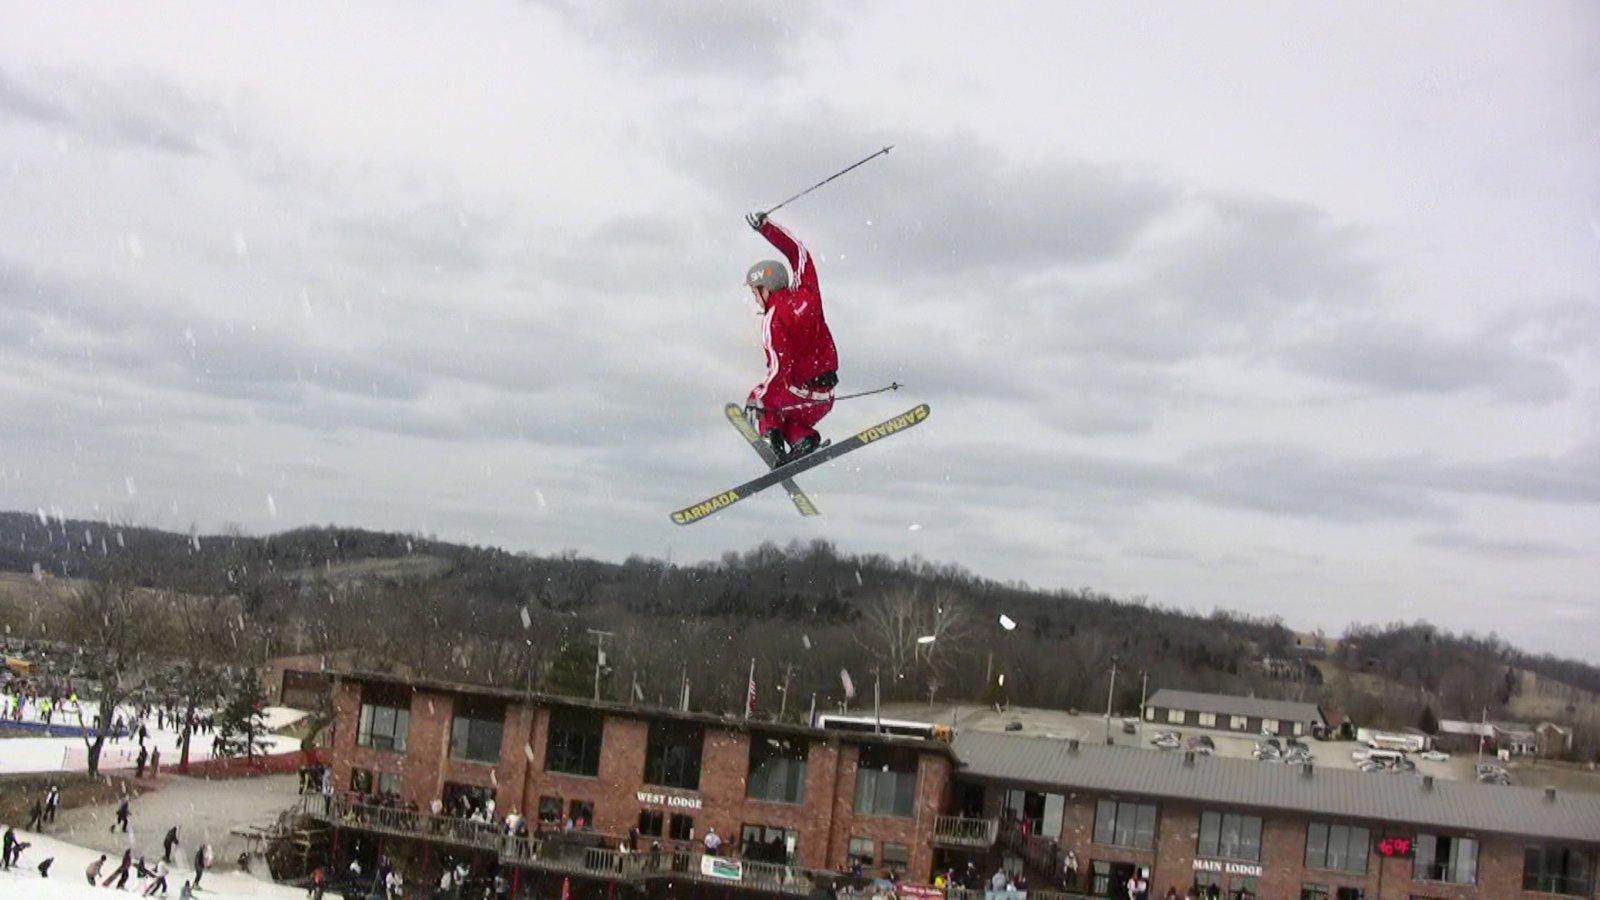 Video still: abe grabs tail